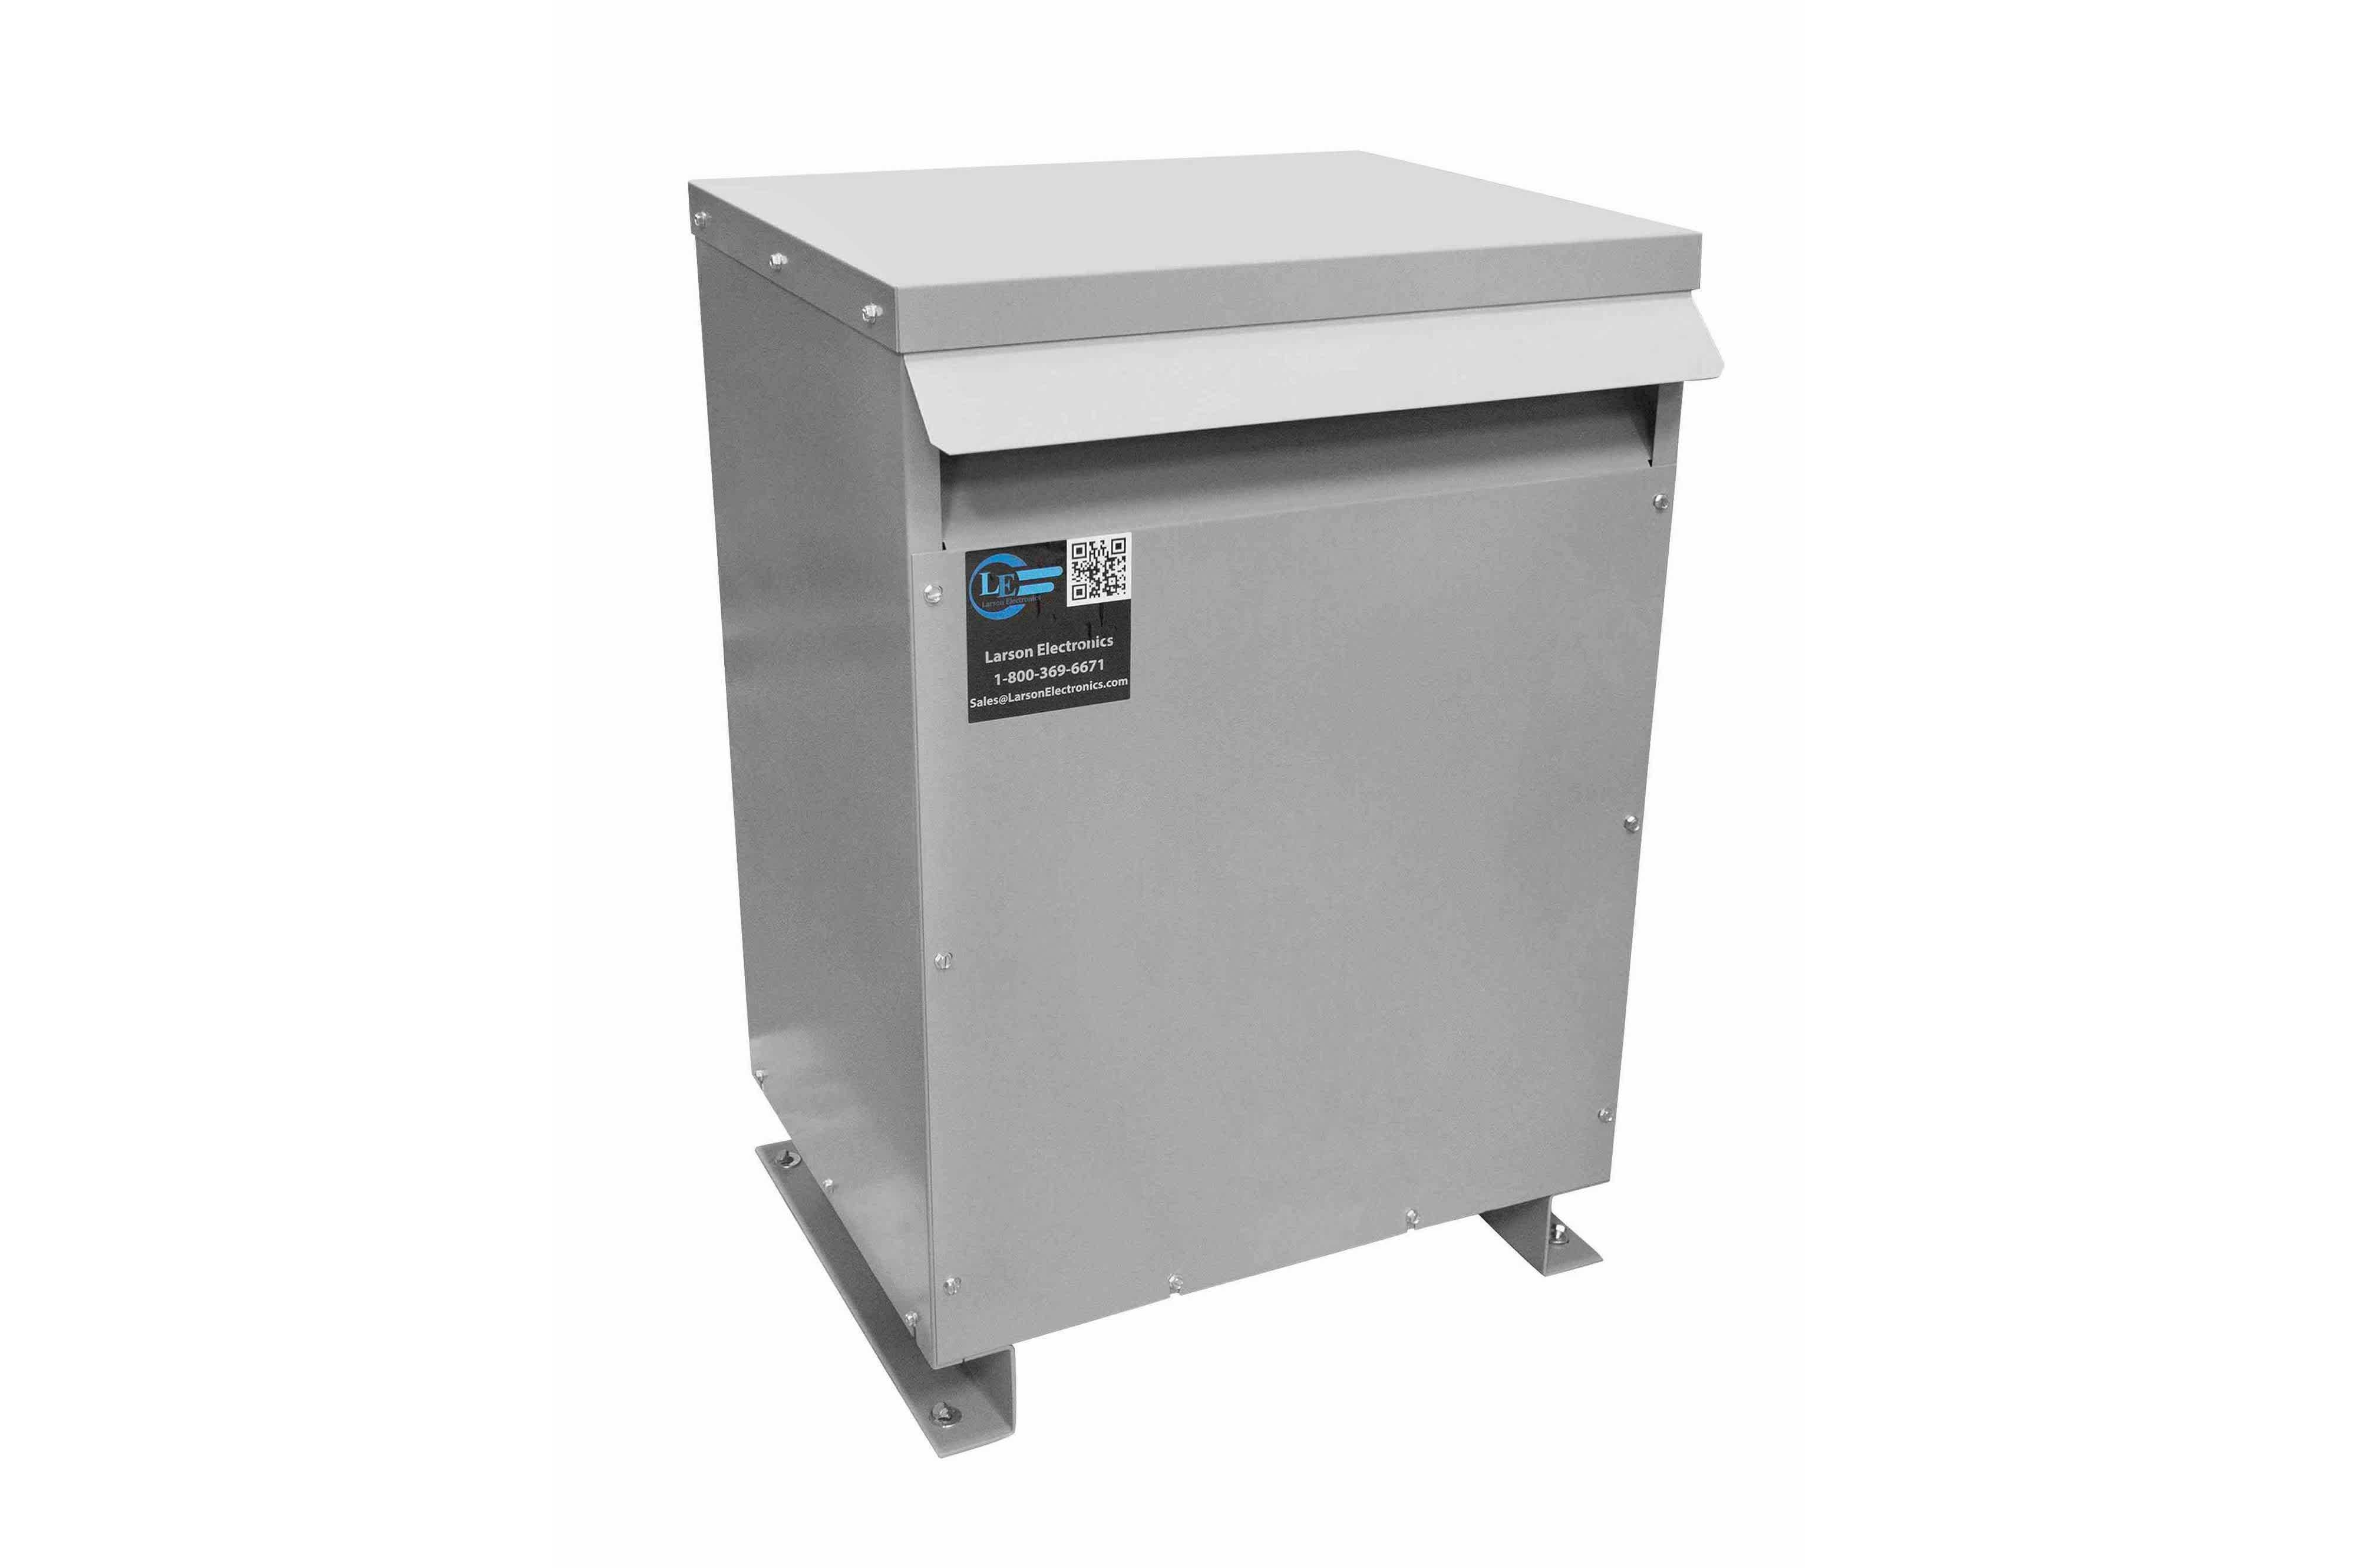 60 kVA 3PH Isolation Transformer, 380V Wye Primary, 480Y/277 Wye-N Secondary, N3R, Ventilated, 60 Hz